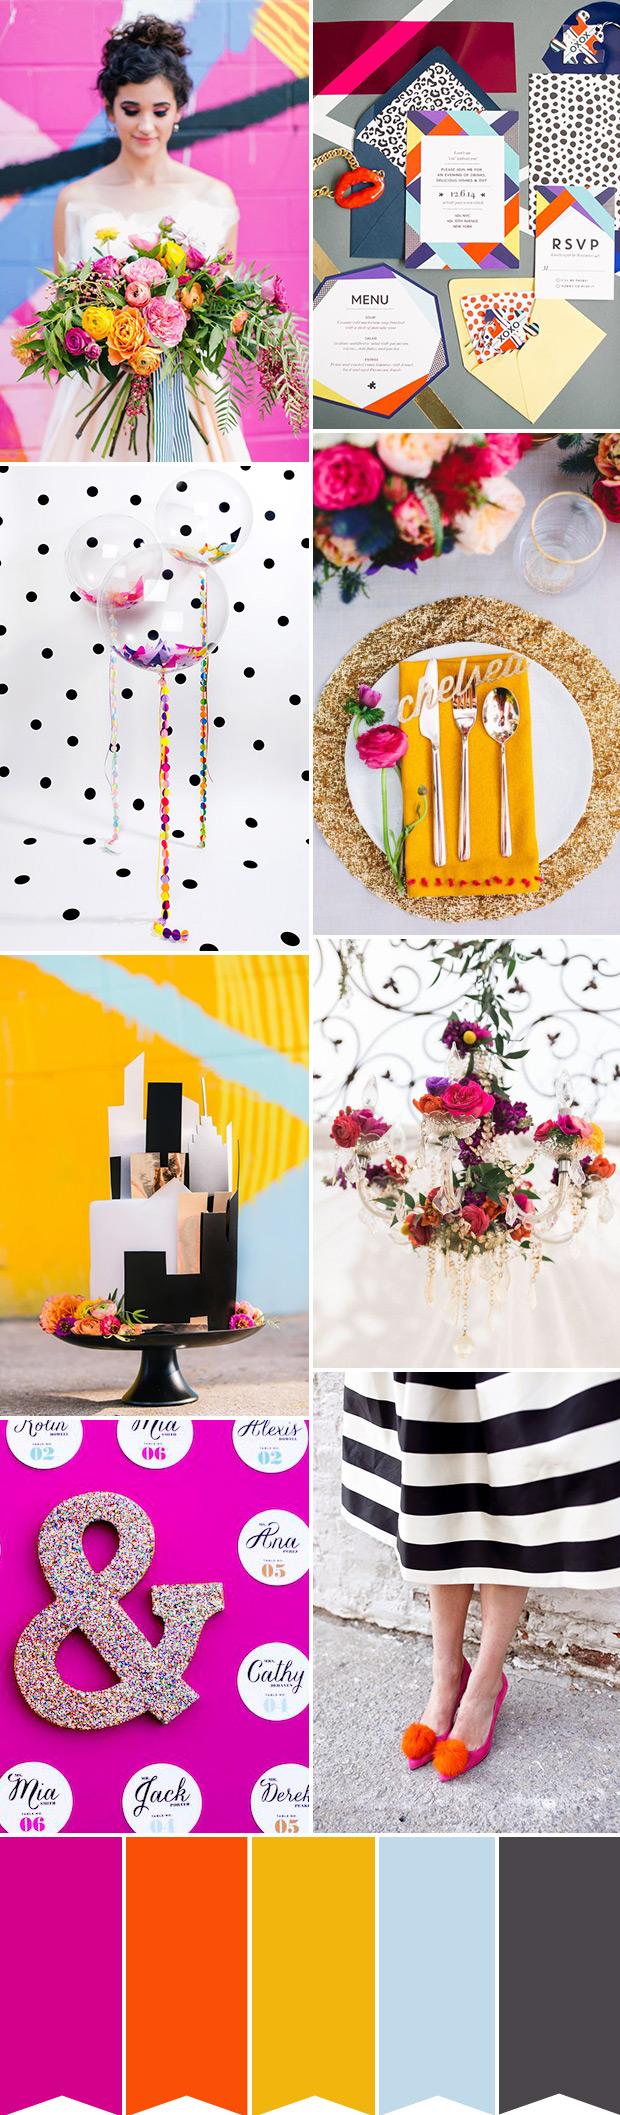 monochrome-and-color-pop-wedding-inspiration.jpg